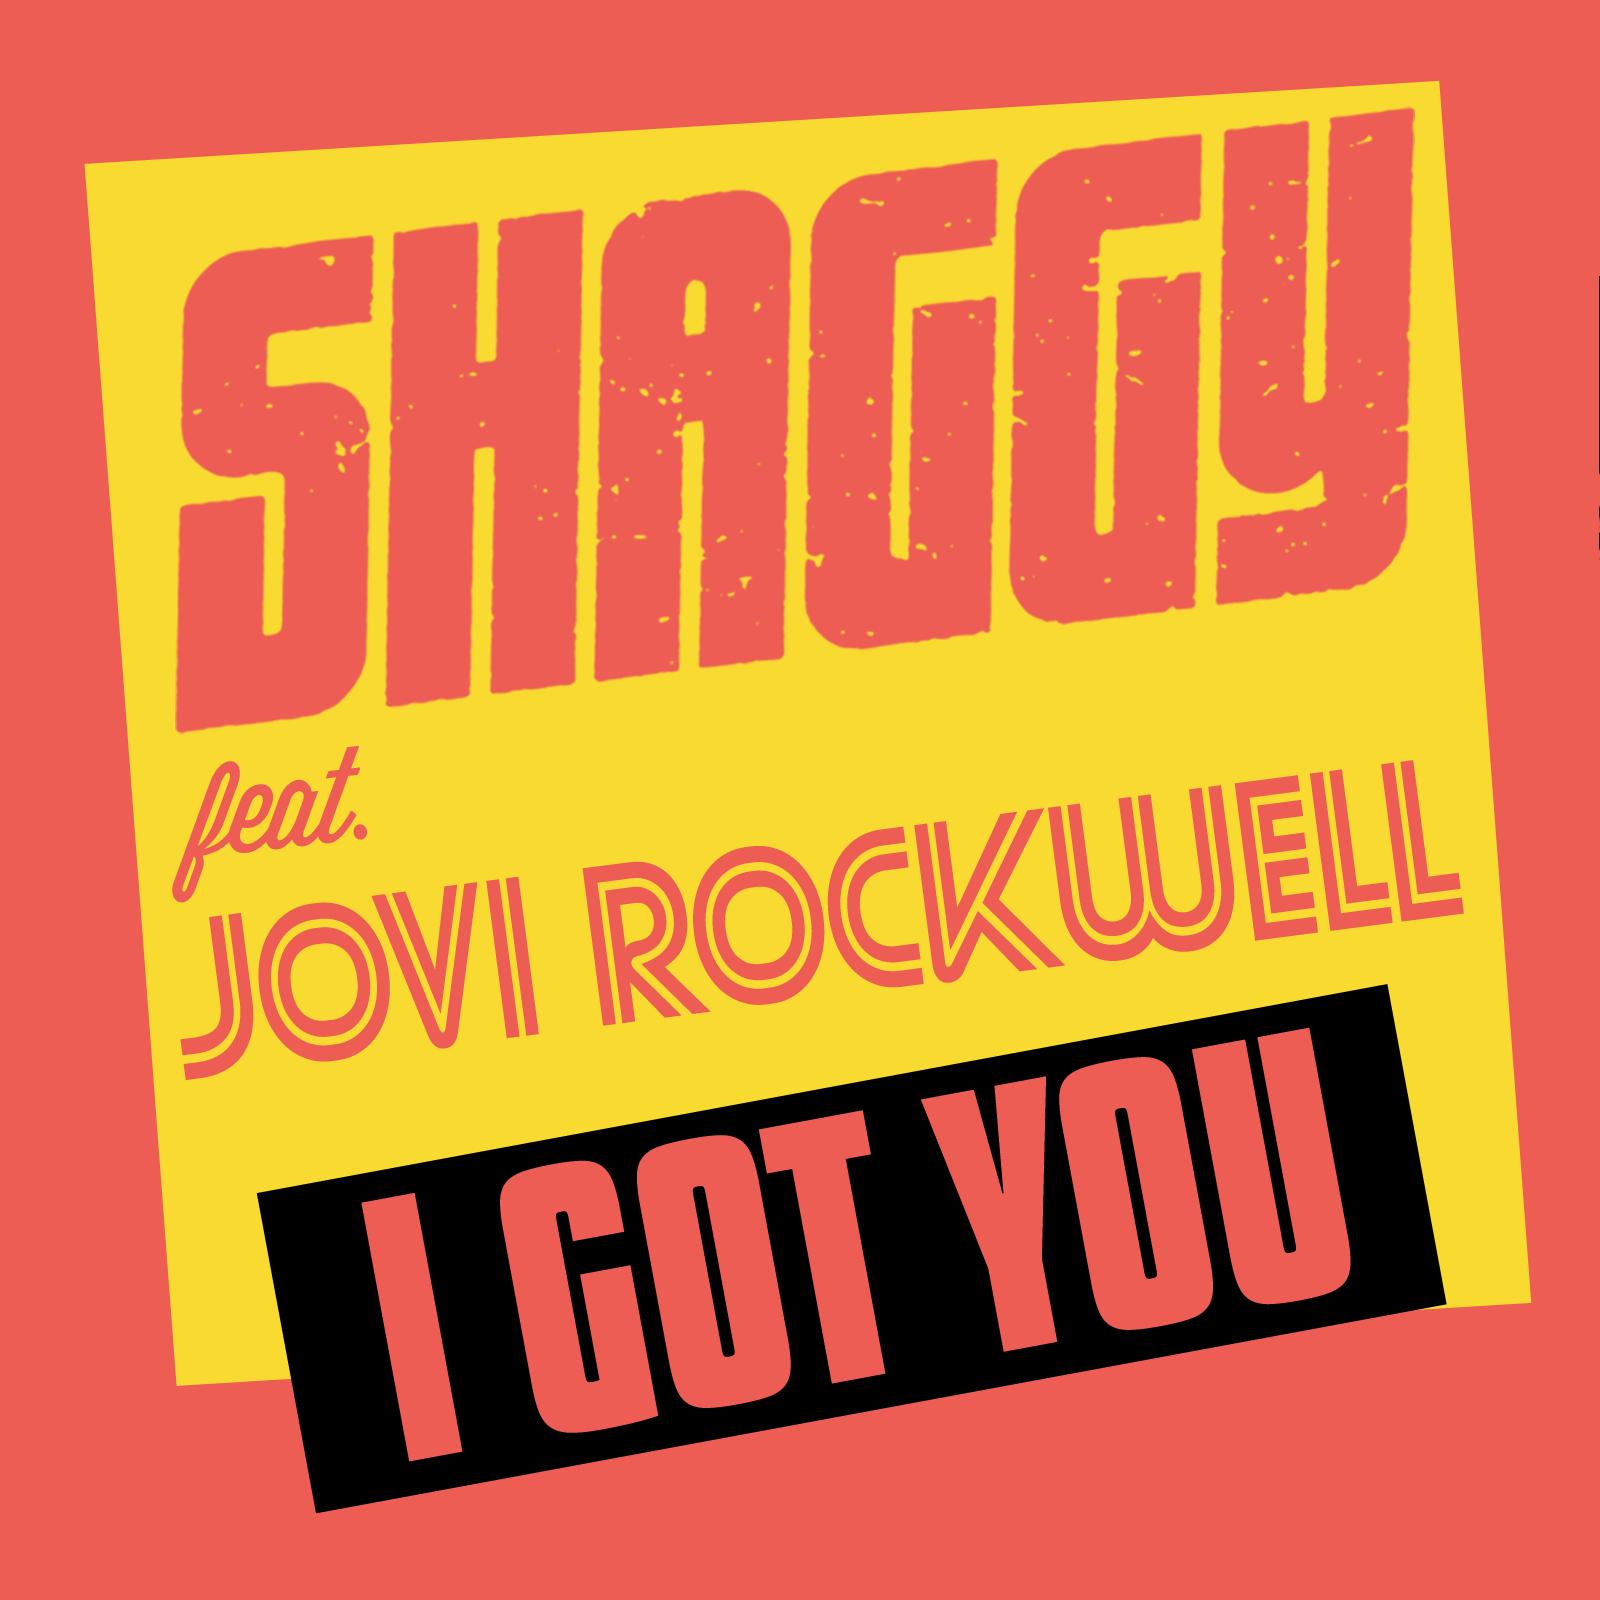 Shaggy - I Got You (feat. Jovi Rockwell) - Single  Cover